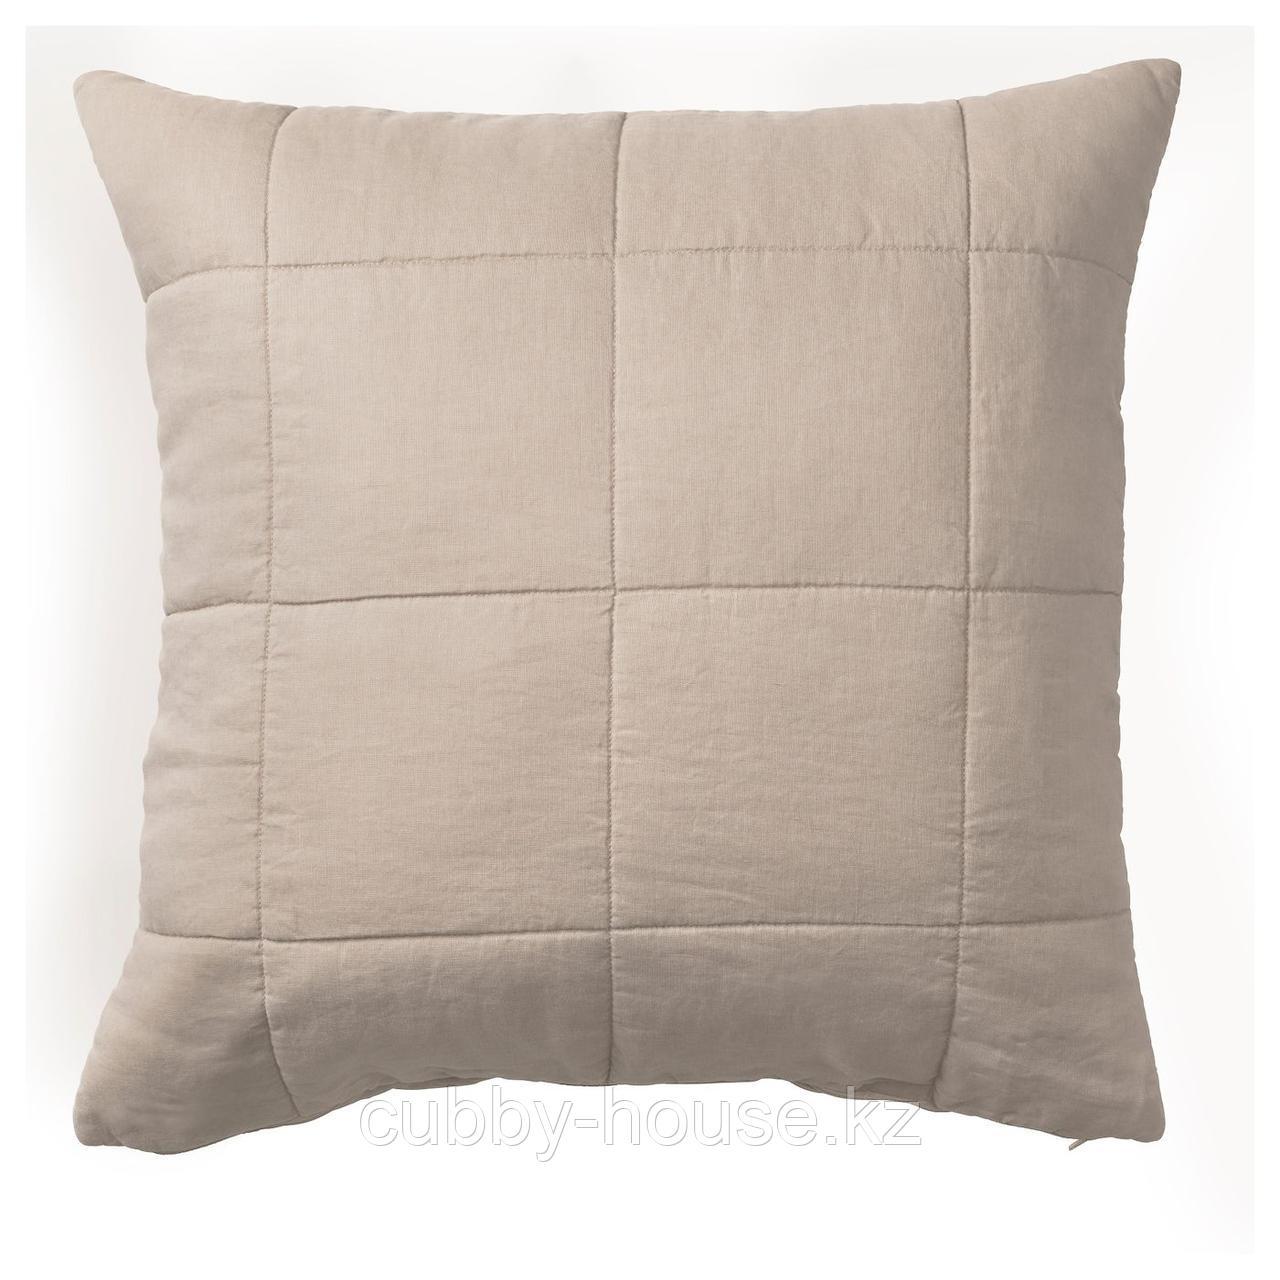 ГУЛЬВЕД Чехол на подушку, неокрашенный, 65x65 см